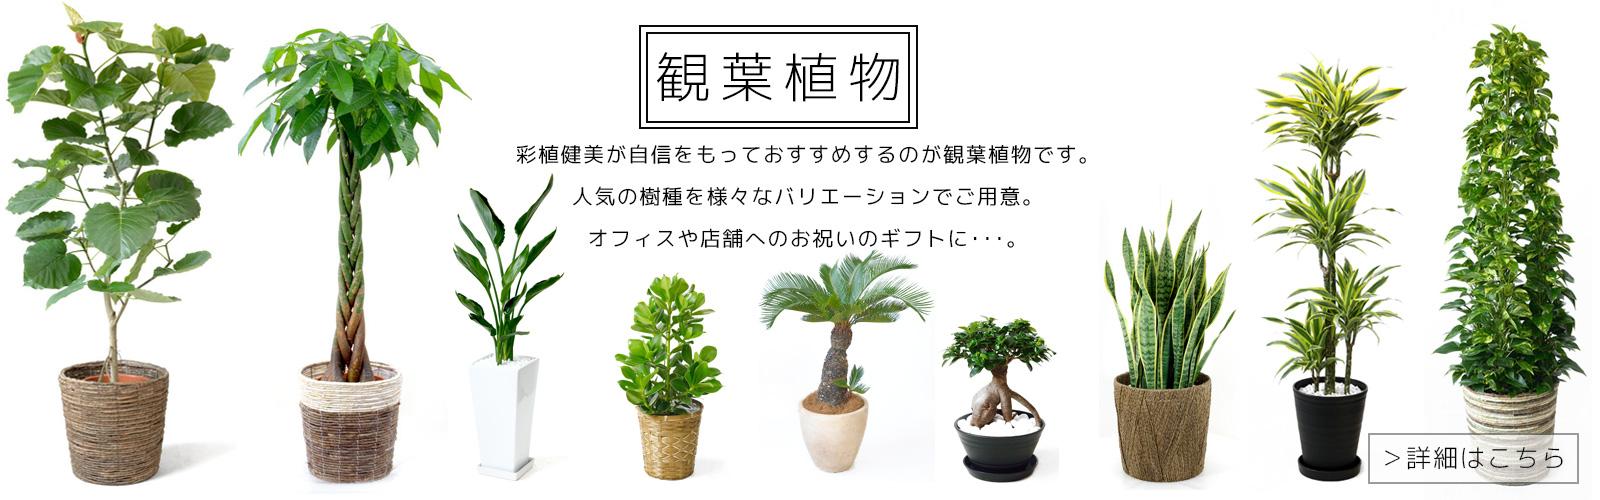 top_03_02.jpg